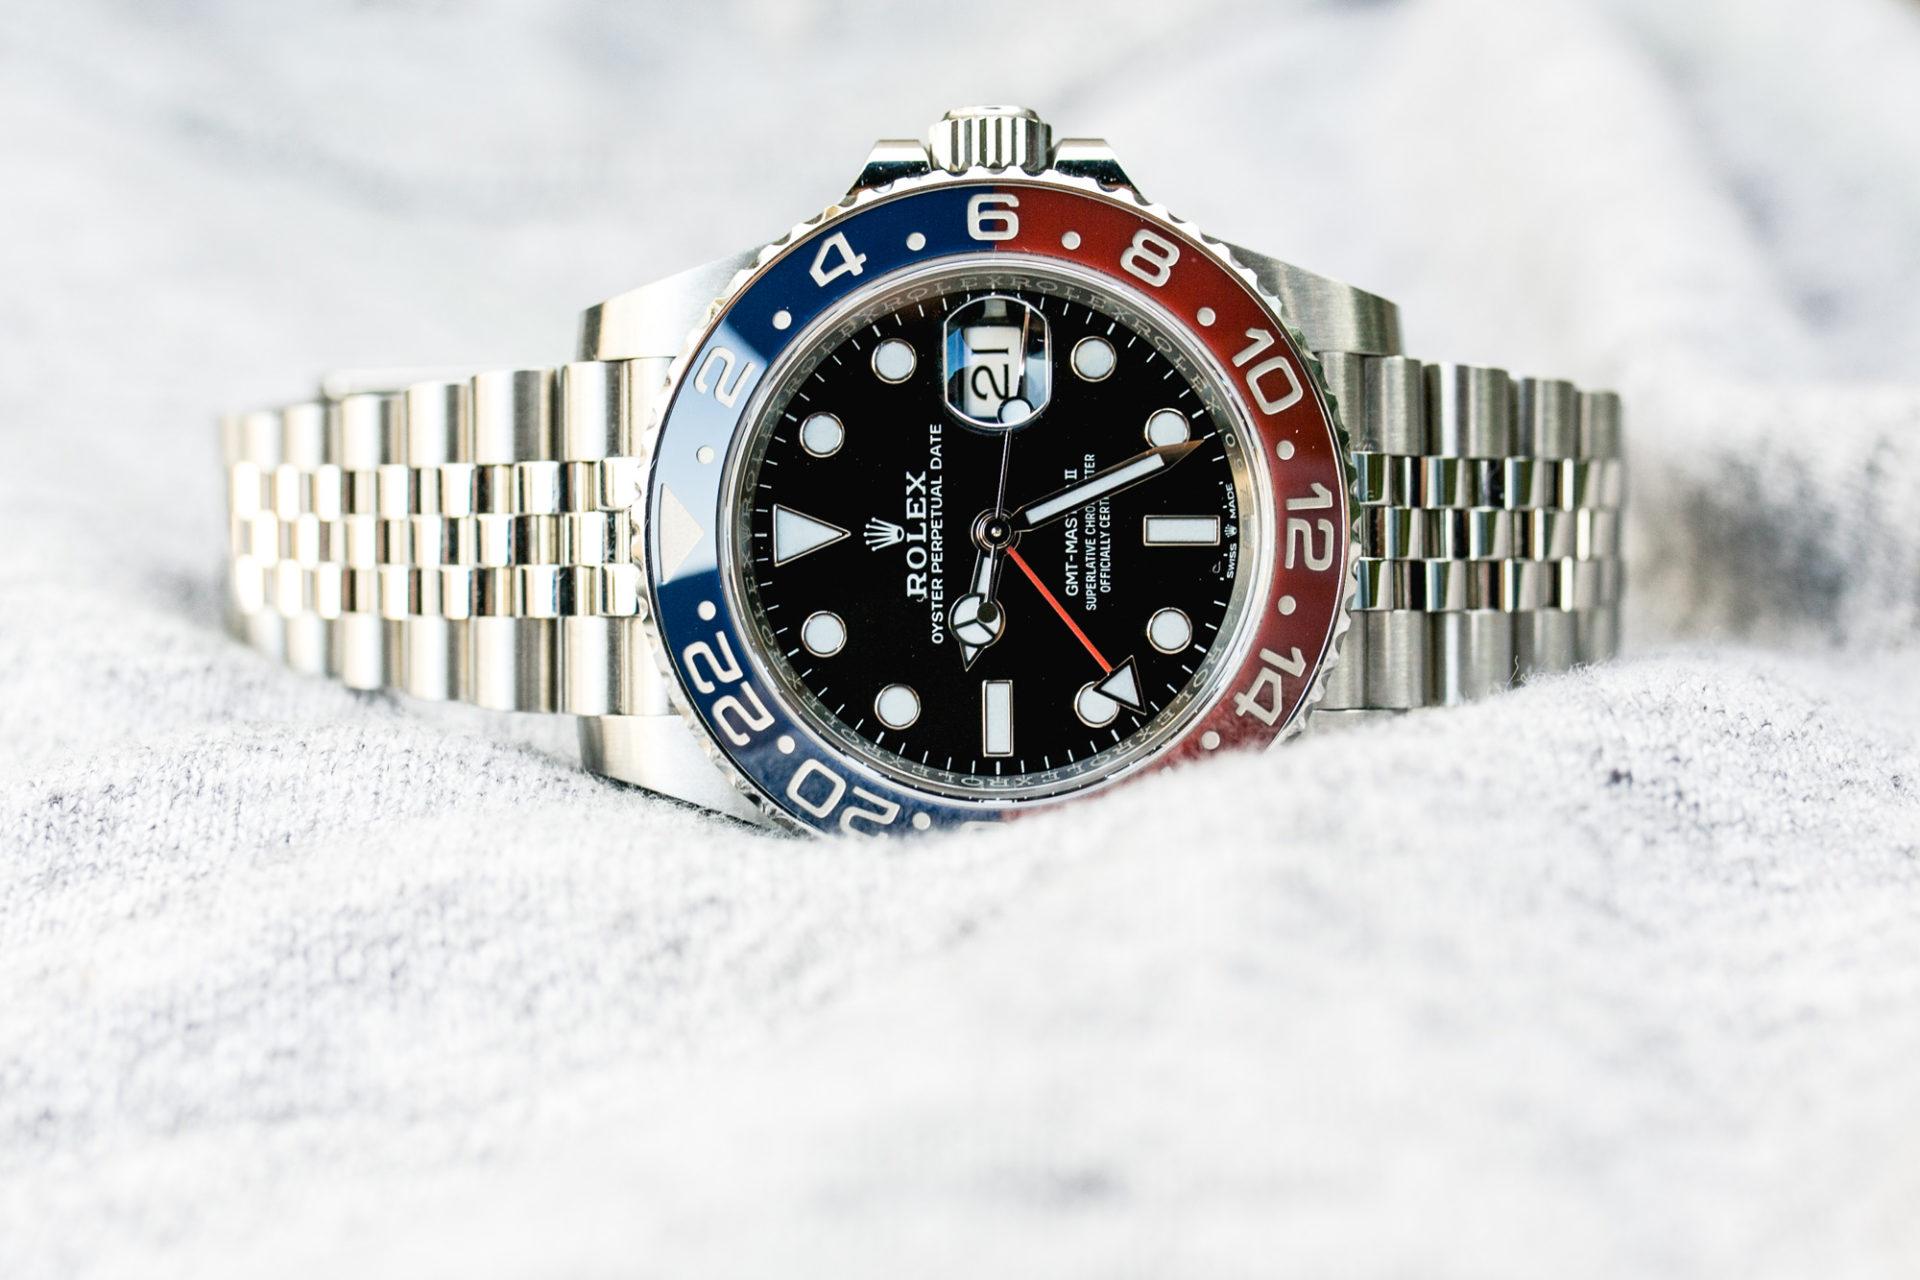 Rolex GMT-Master II Ref 126710BLRO - Focus